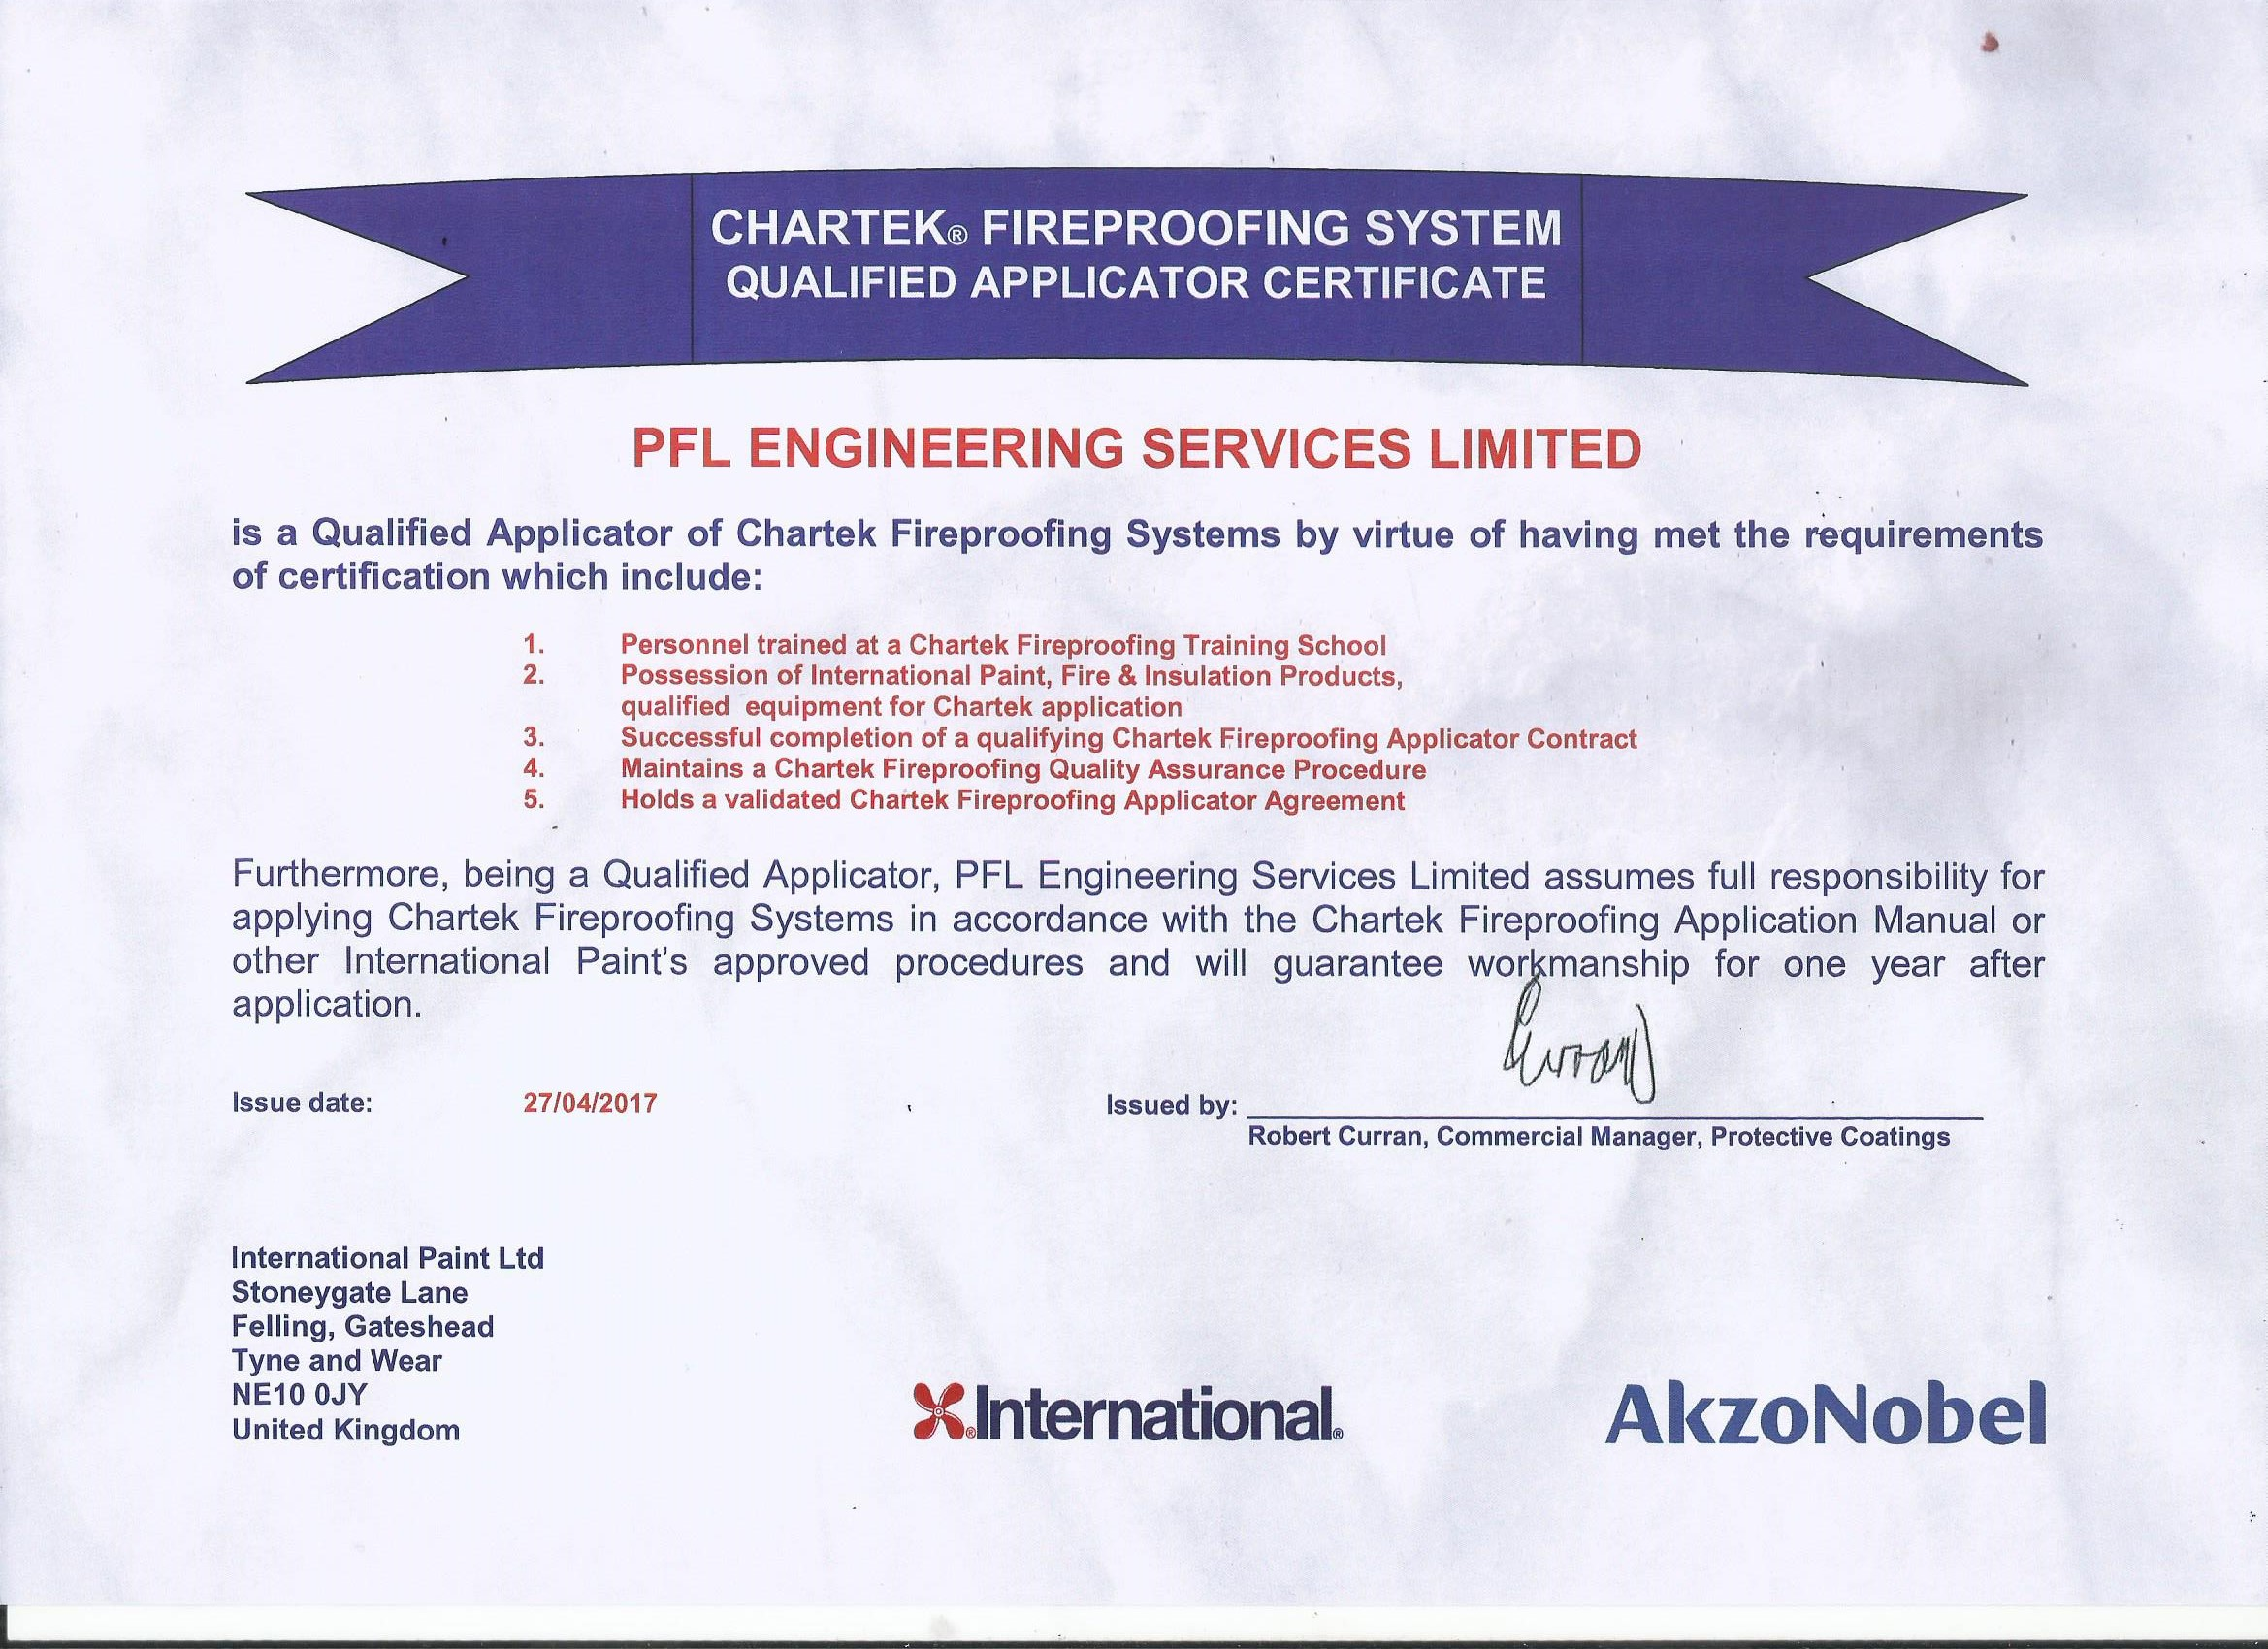 Chartek Fireproofing Applicator Certificate